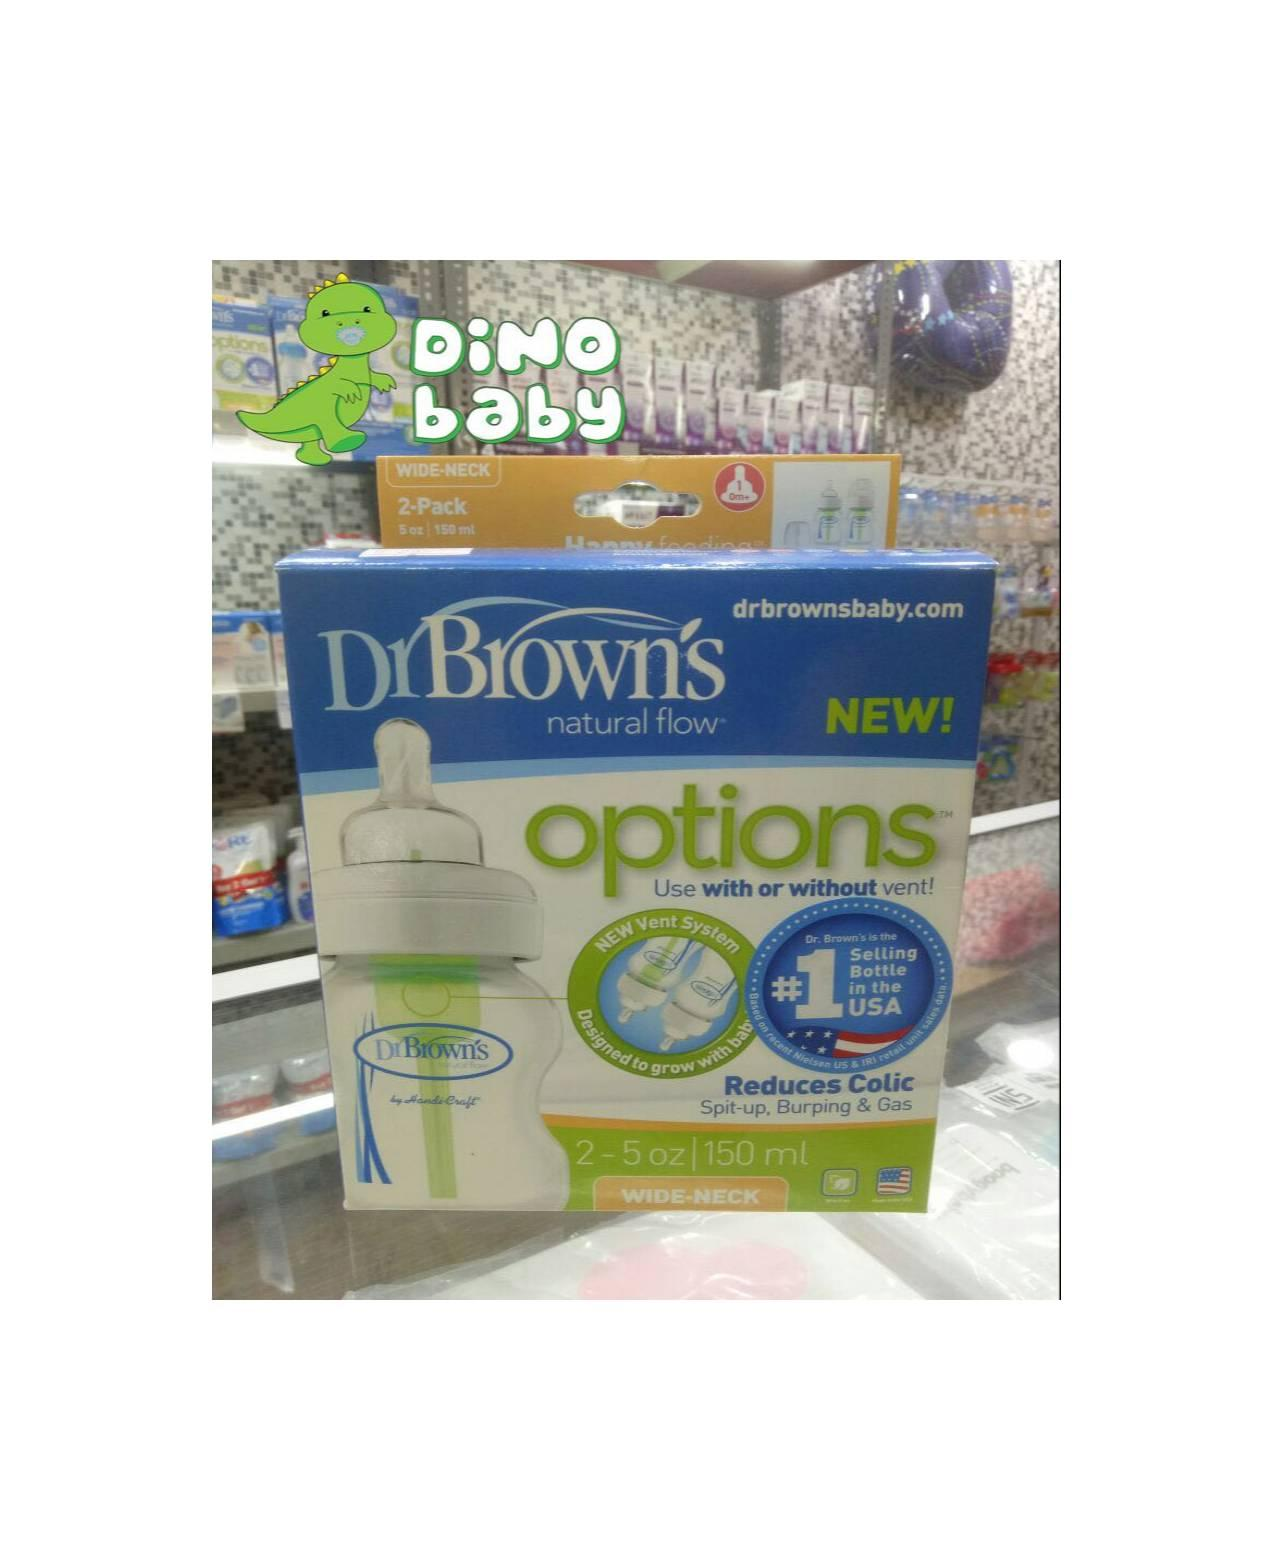 Philips Avent Scf65123 Natural New Spiral Newborn Flow Teats 0m Isi 125ml 2 Dr Brown Botol Susu Wide Neck 150 Ml